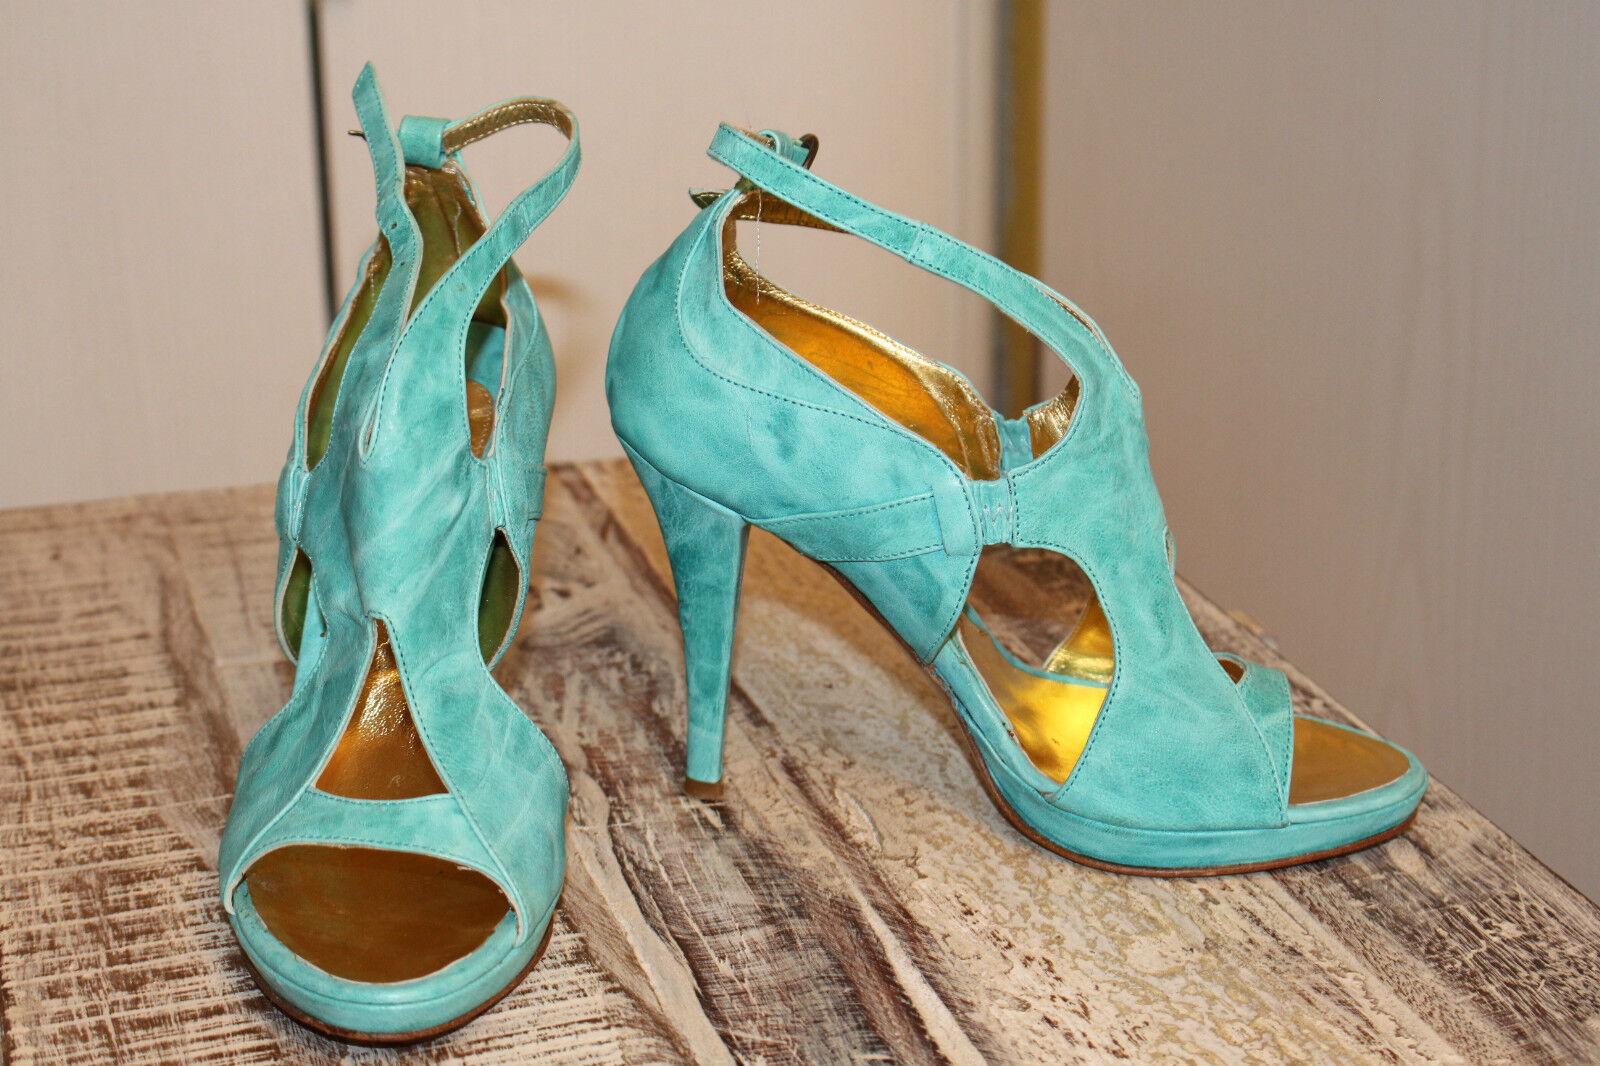 NS004t-w.NEU FASHION 36,5 37 ITALY Pumps echt Leder türkis MARY KYRI high heels Pumps ITALY 08d656